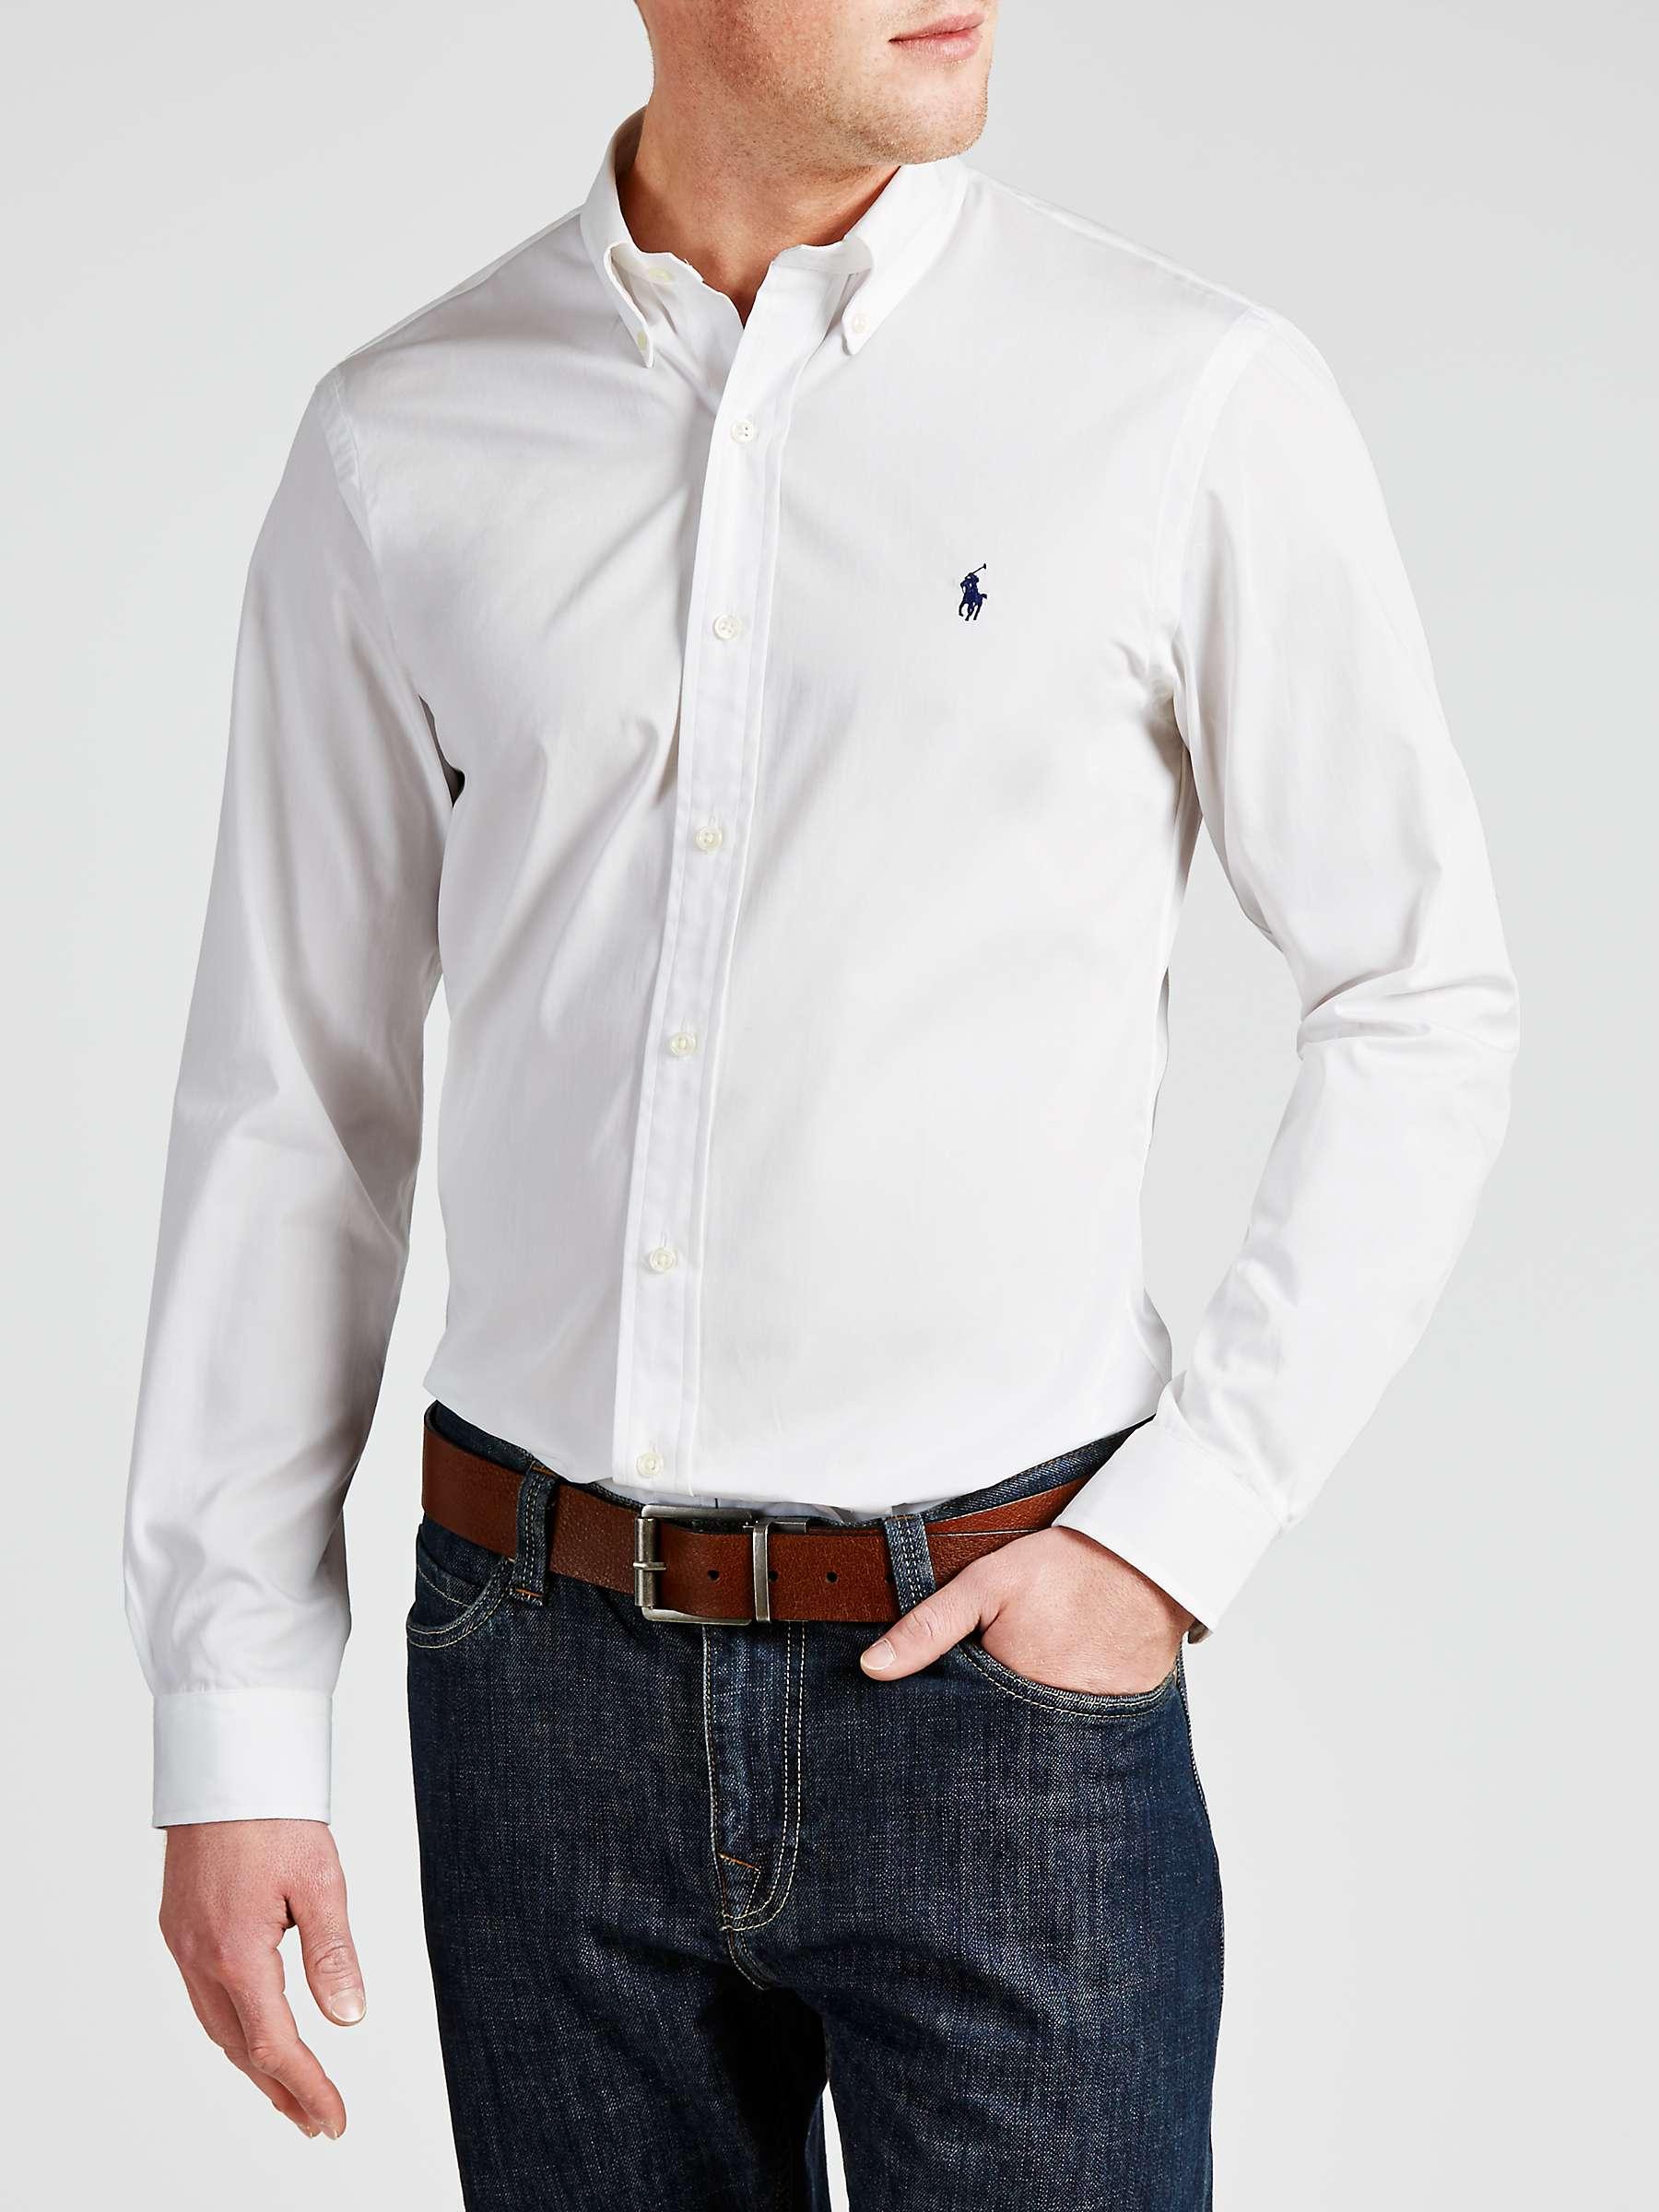 Polo Ralph Lauren Slim Fit Cotton Poplin Shirt, White